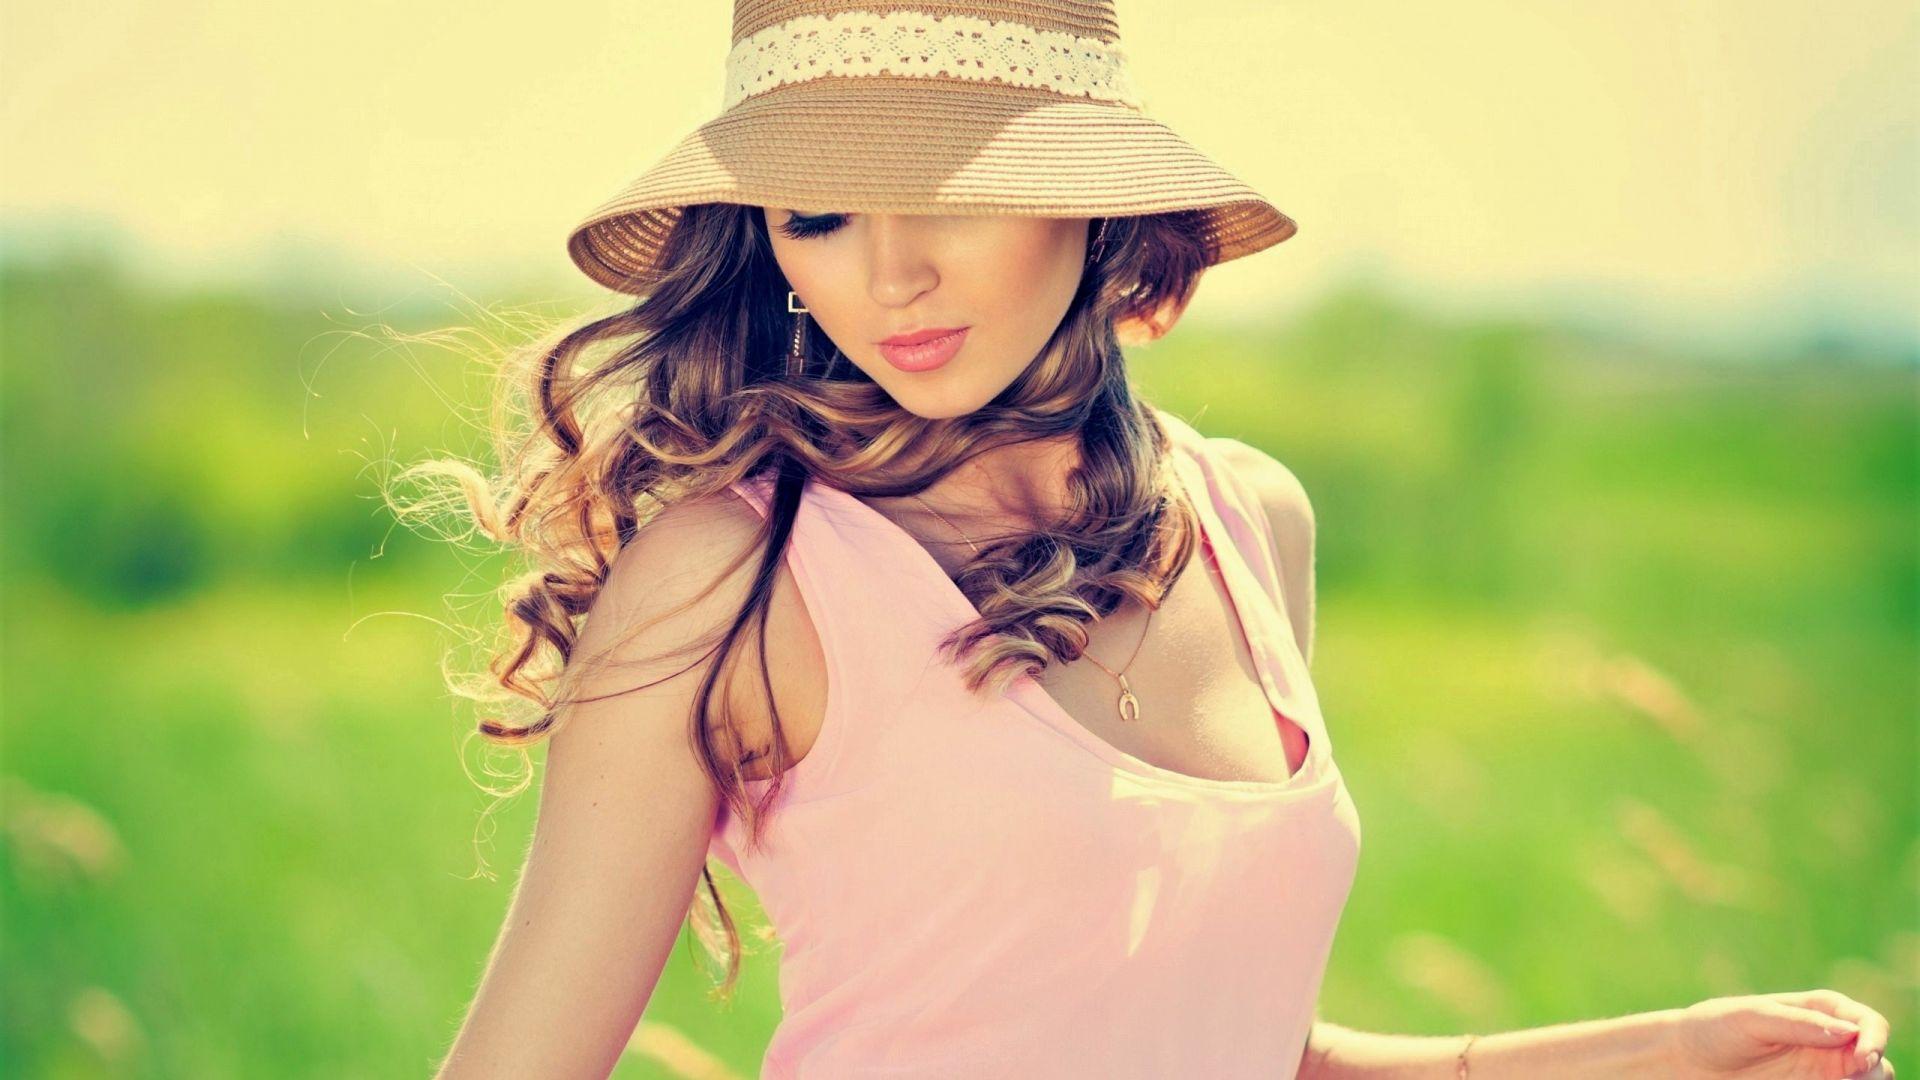 Wallpaper Summer, outdoor, girl model